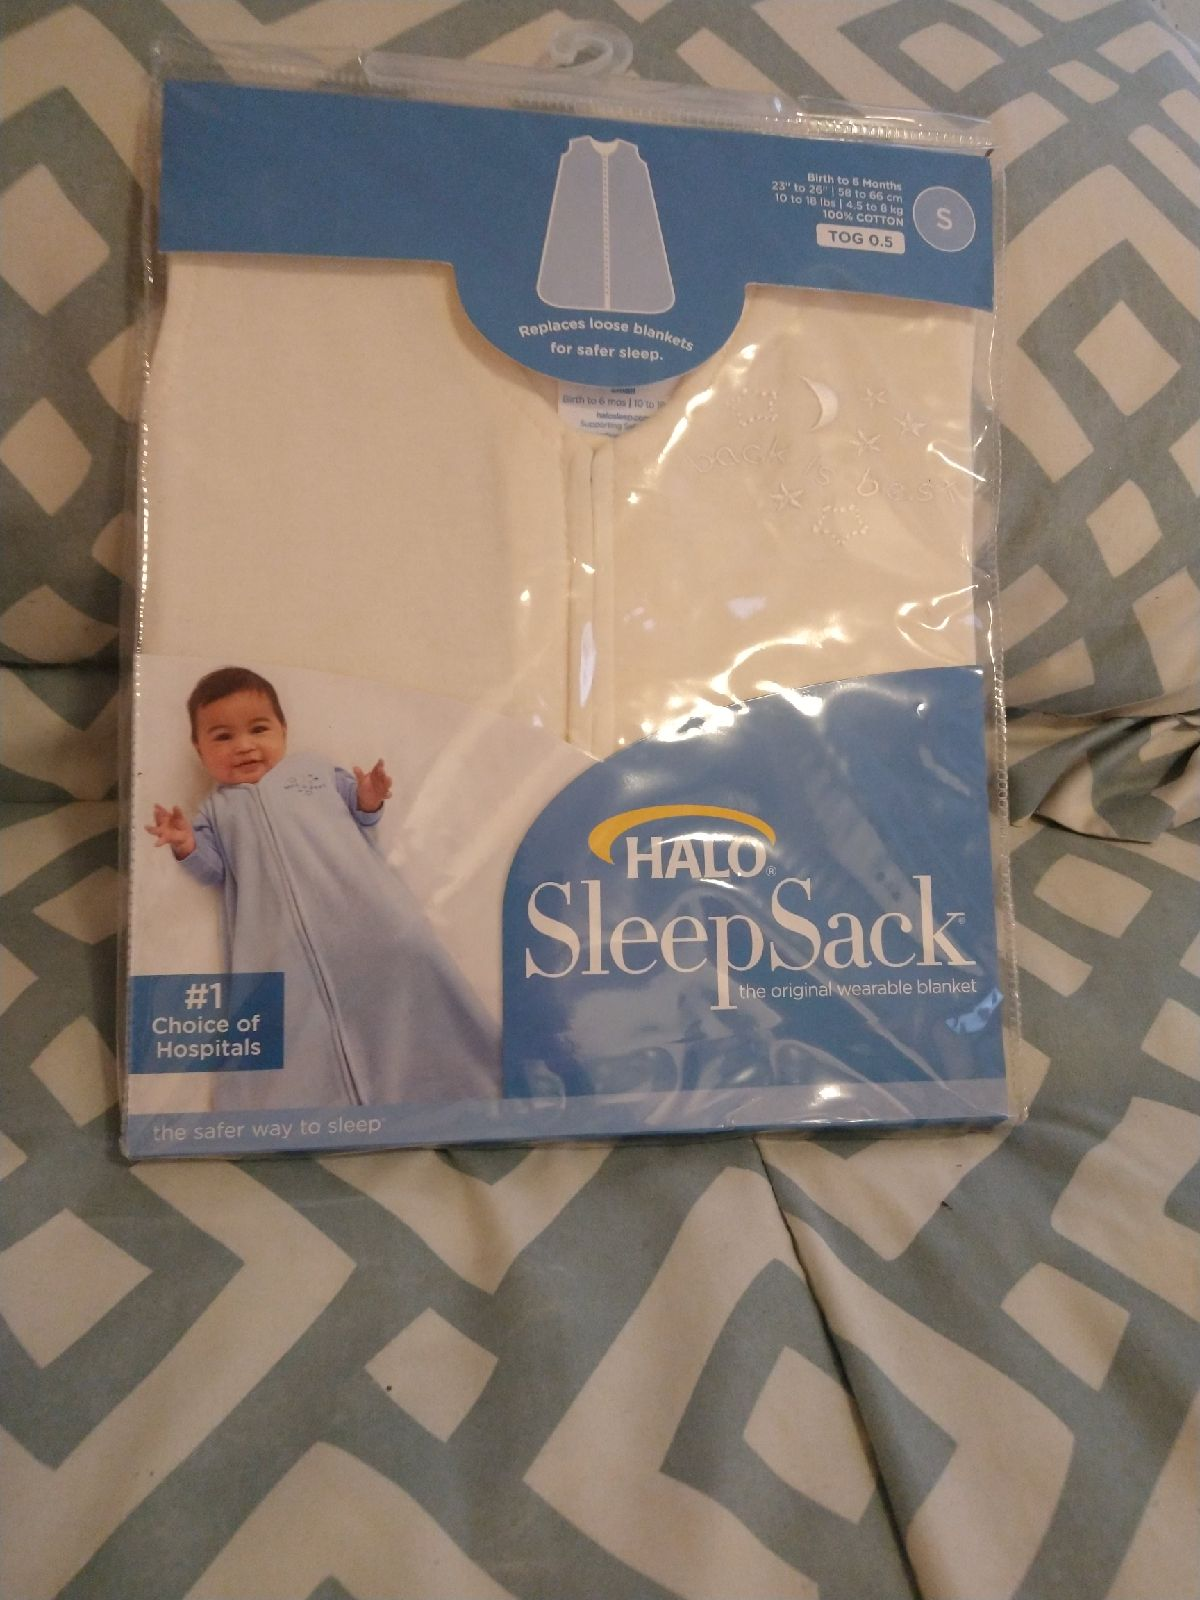 ASleep Sack the original wearing blanket